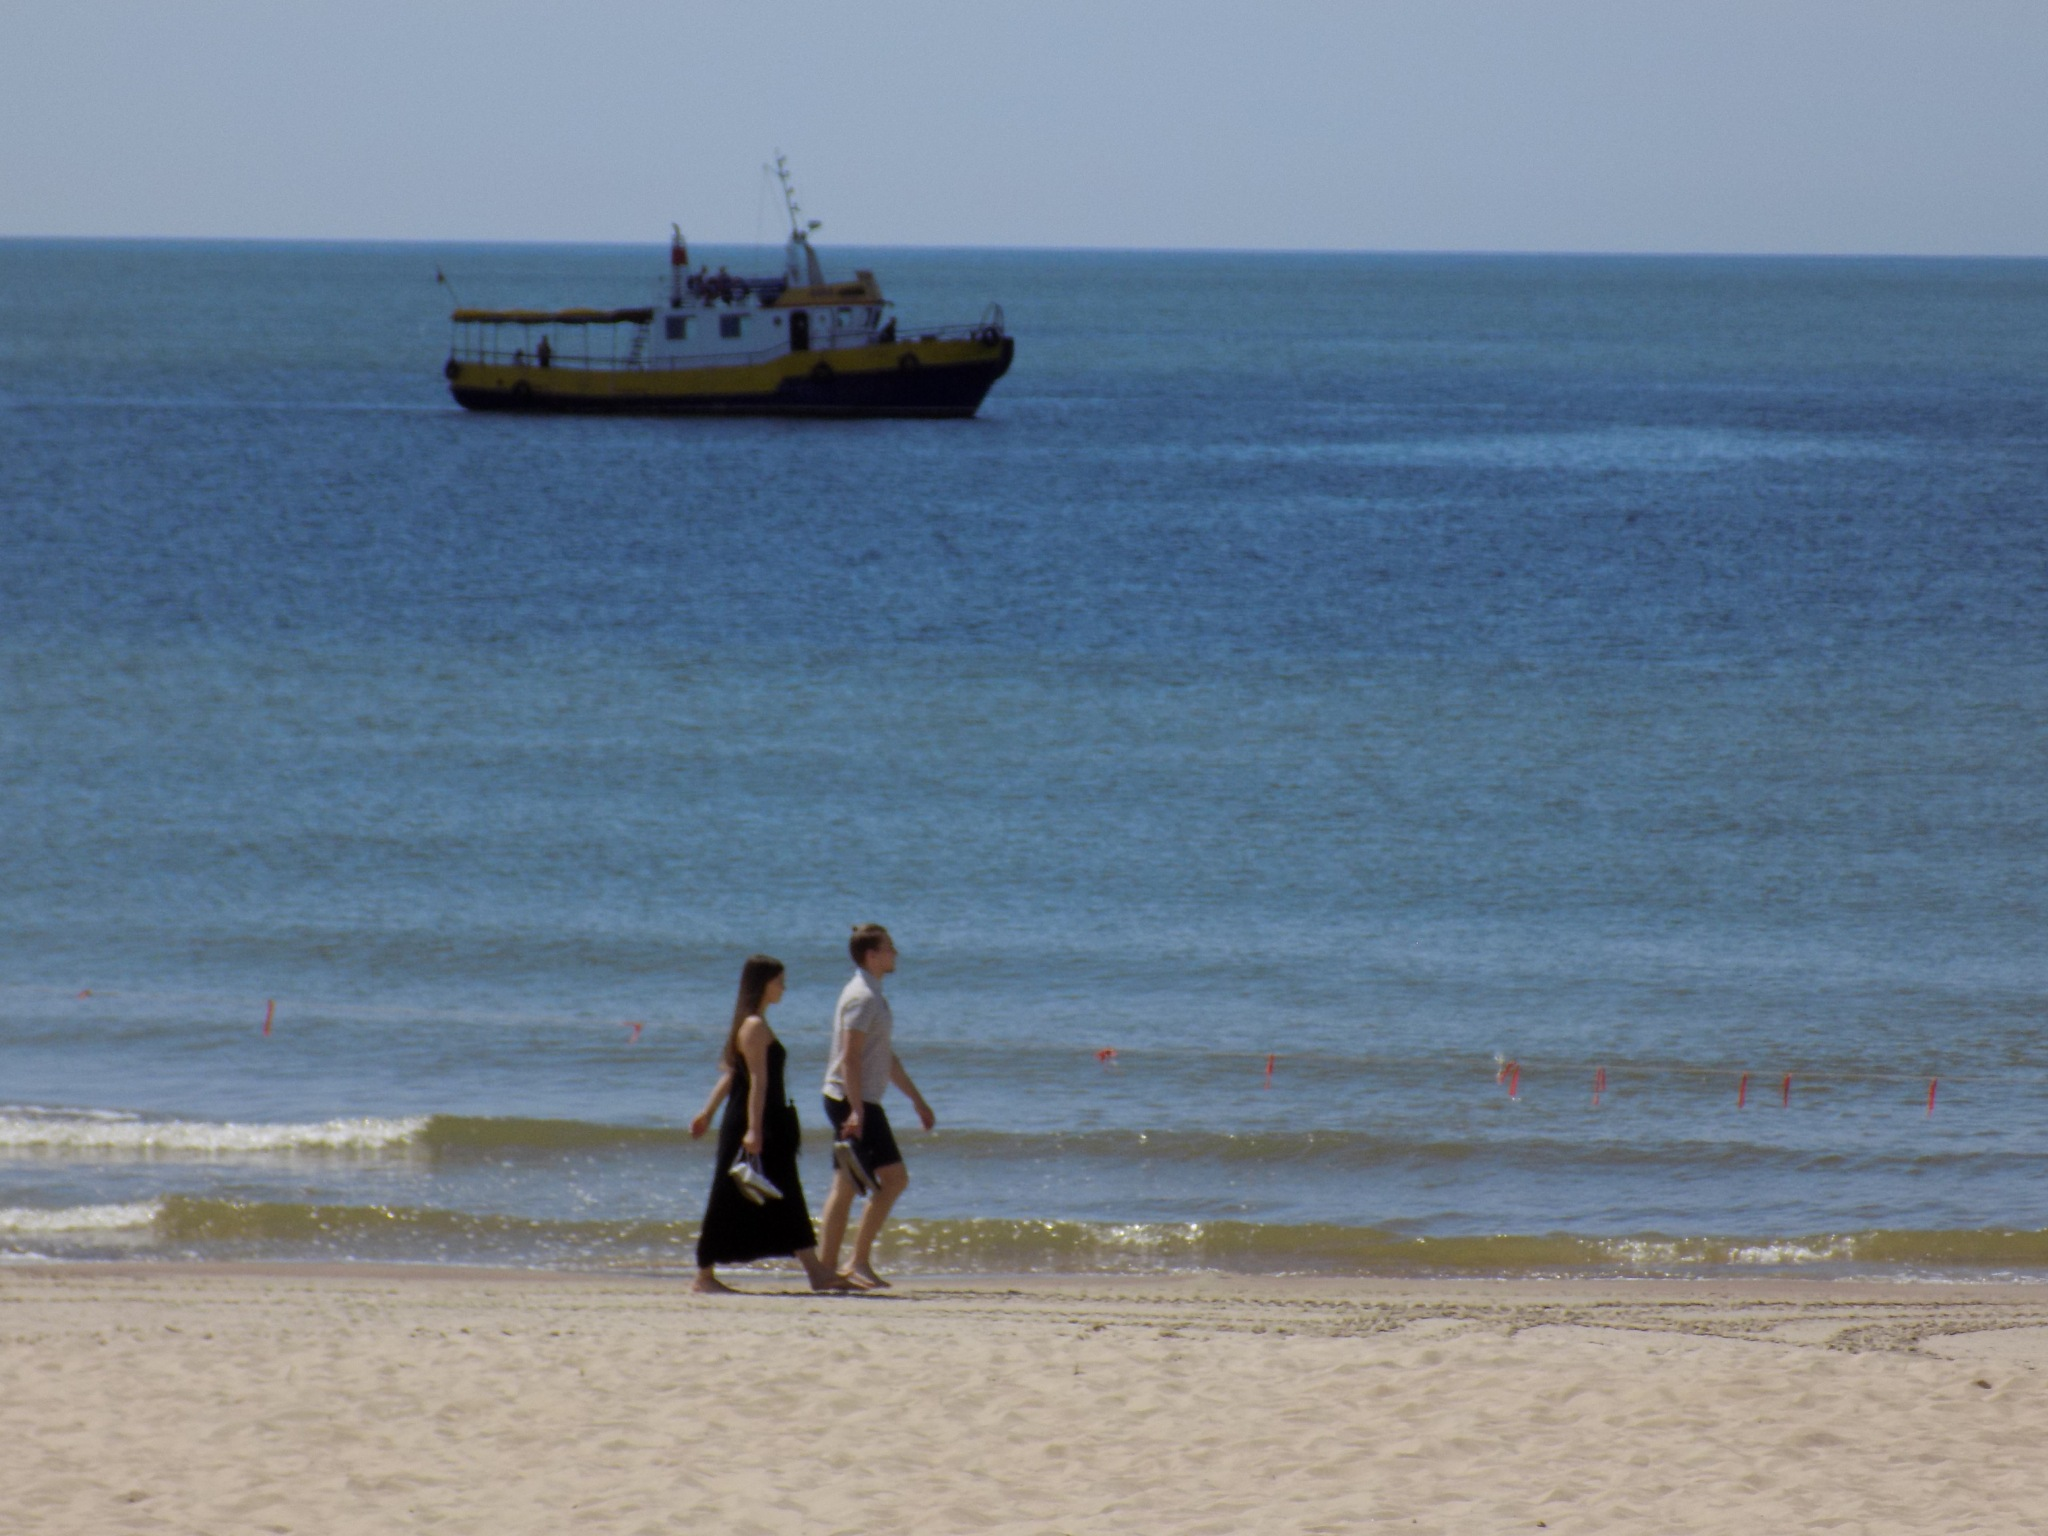 On the seashore by uzkuraitiene62